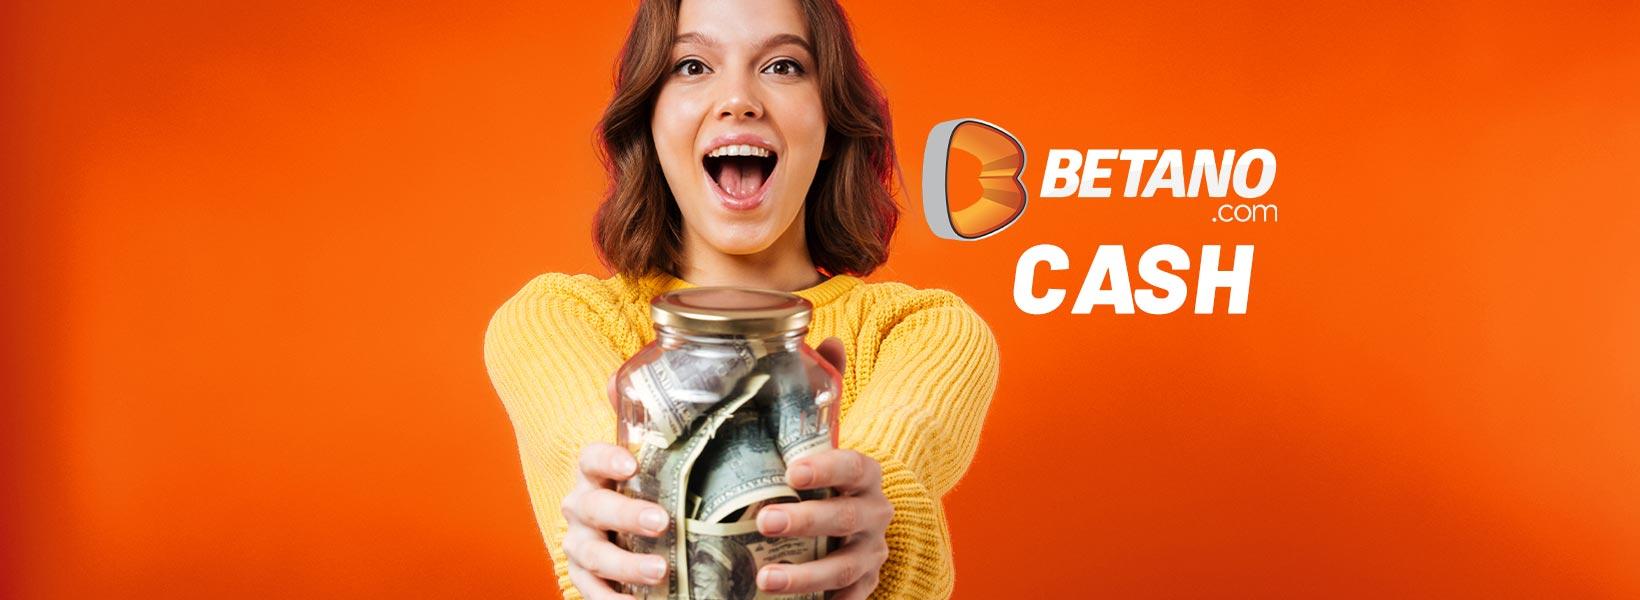 betano-cash